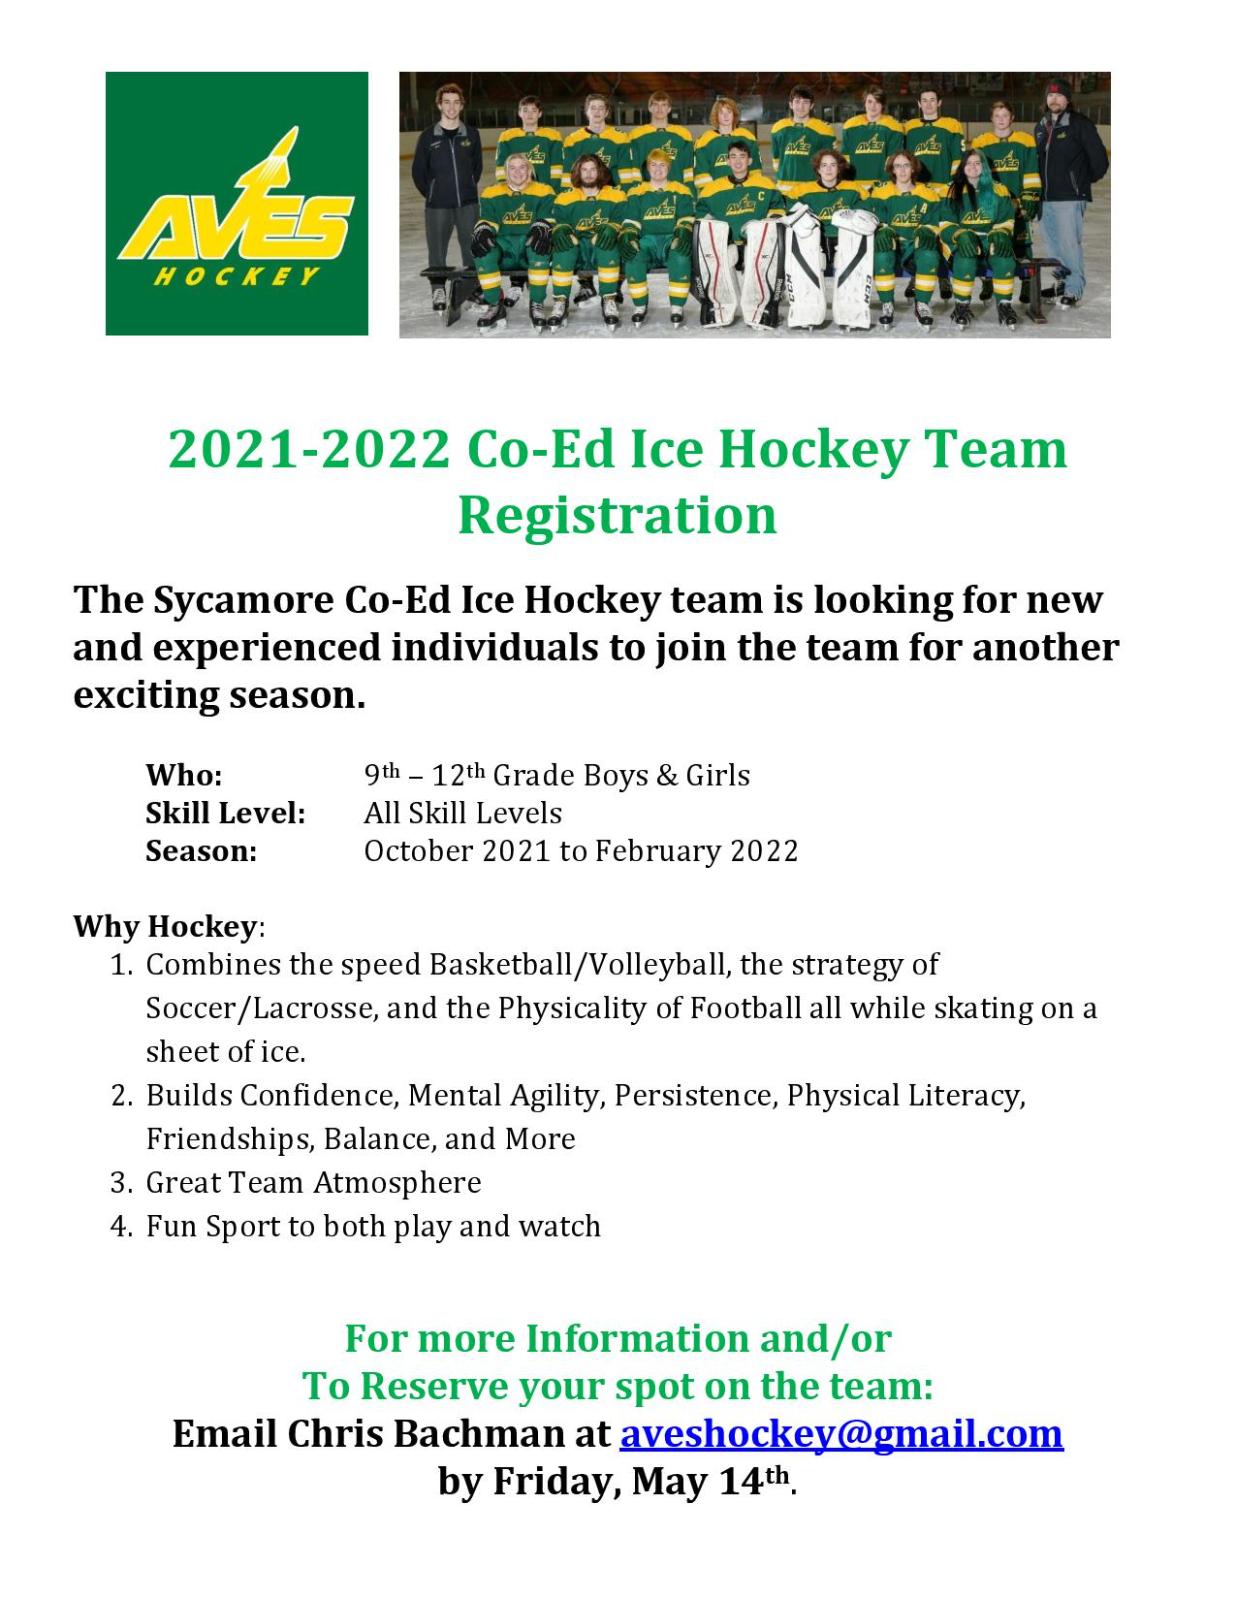 2021-22 Co-Ed Ice Hockey Registration!